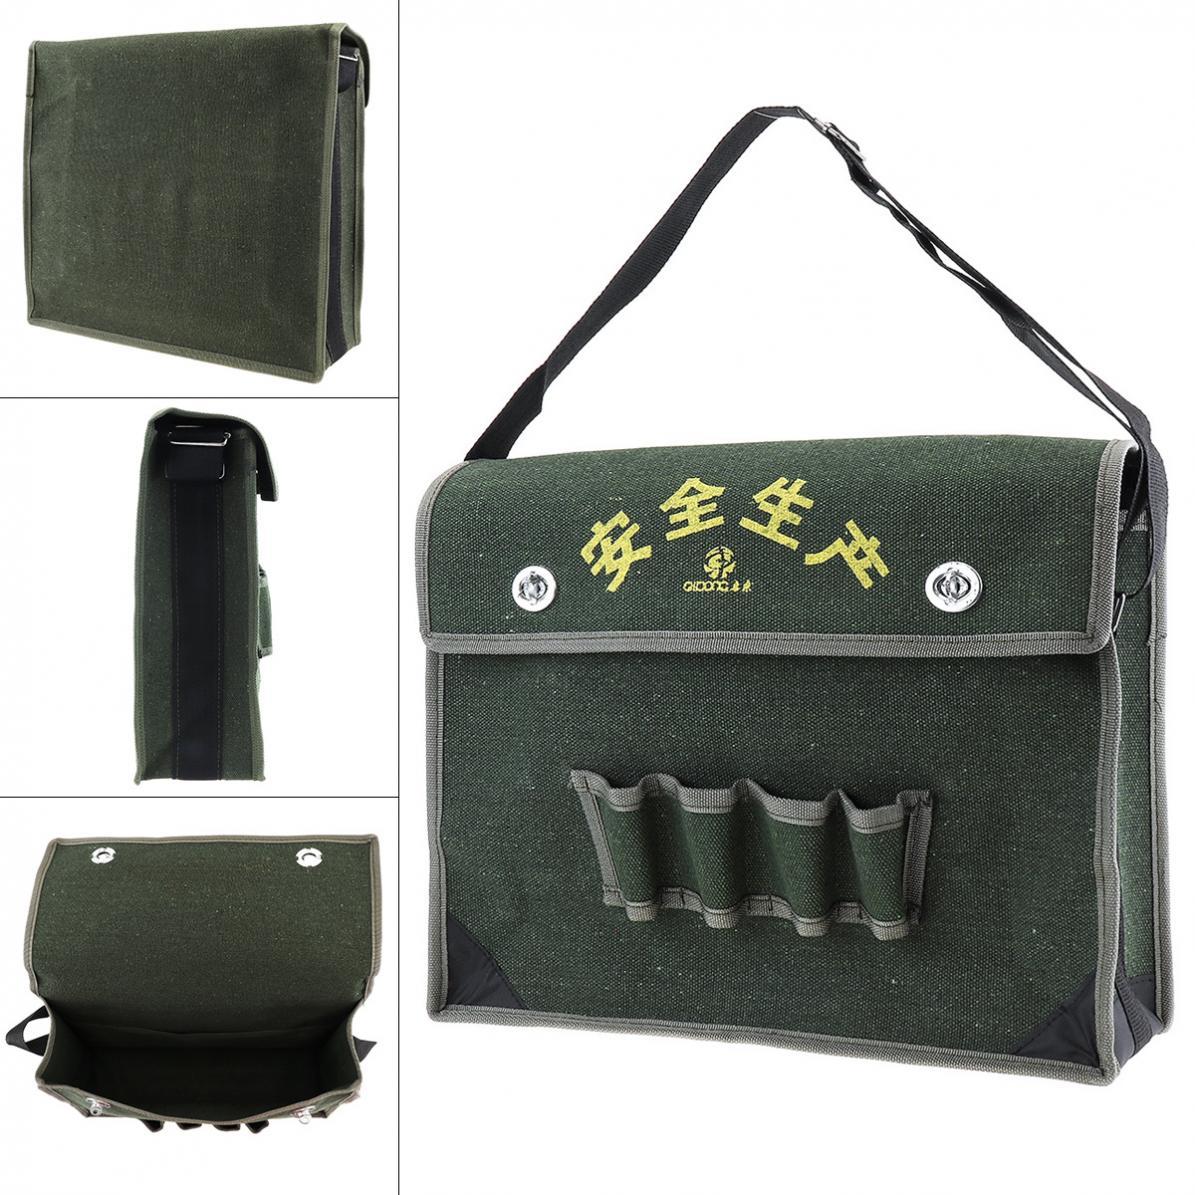 15.5 Inch 600D Oxford Cloth Waterproof Flip-type Single-shoulder Tool Bag 4 Holes 2 Pockets And Adjustable Single Hanging Strap